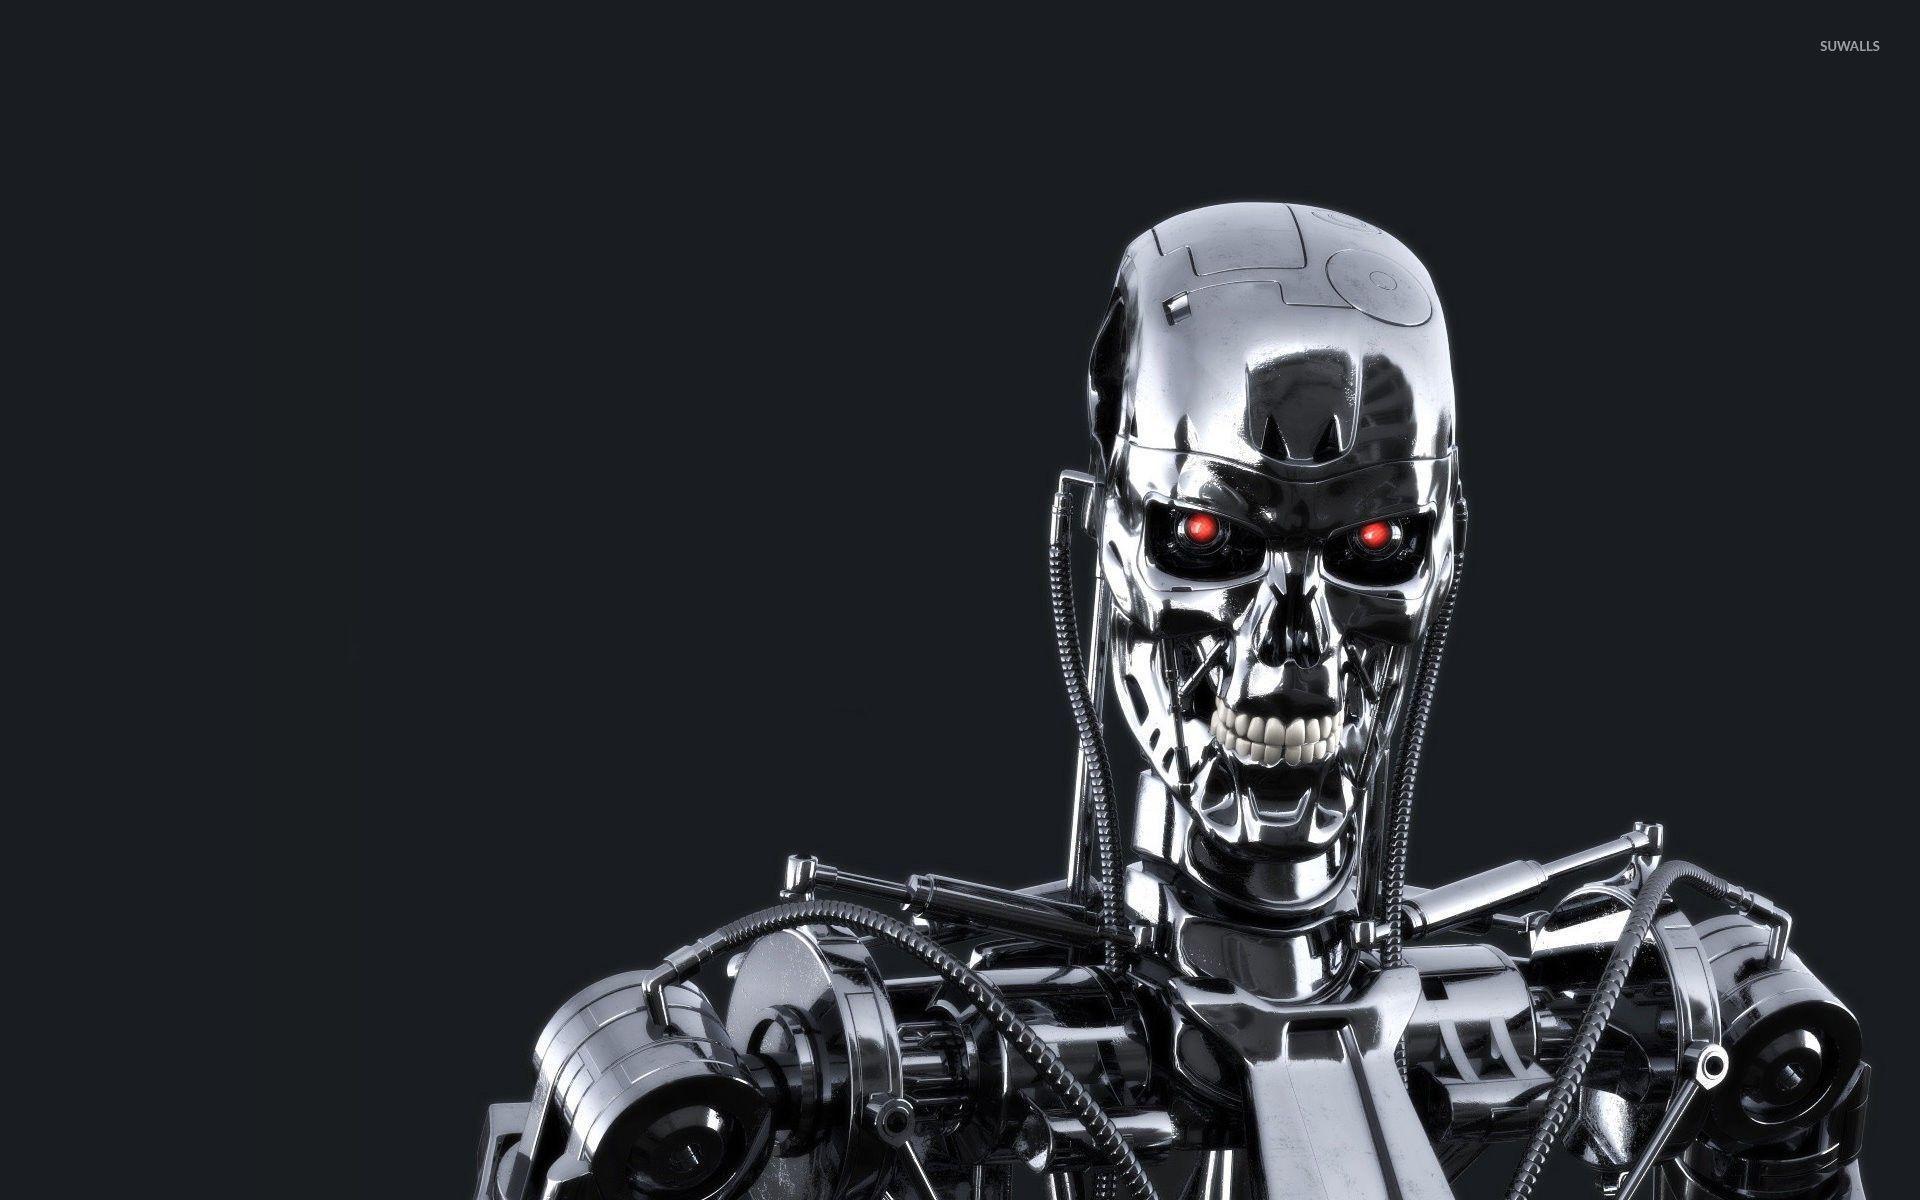 Terminator wallpaper - Movie wallpapers